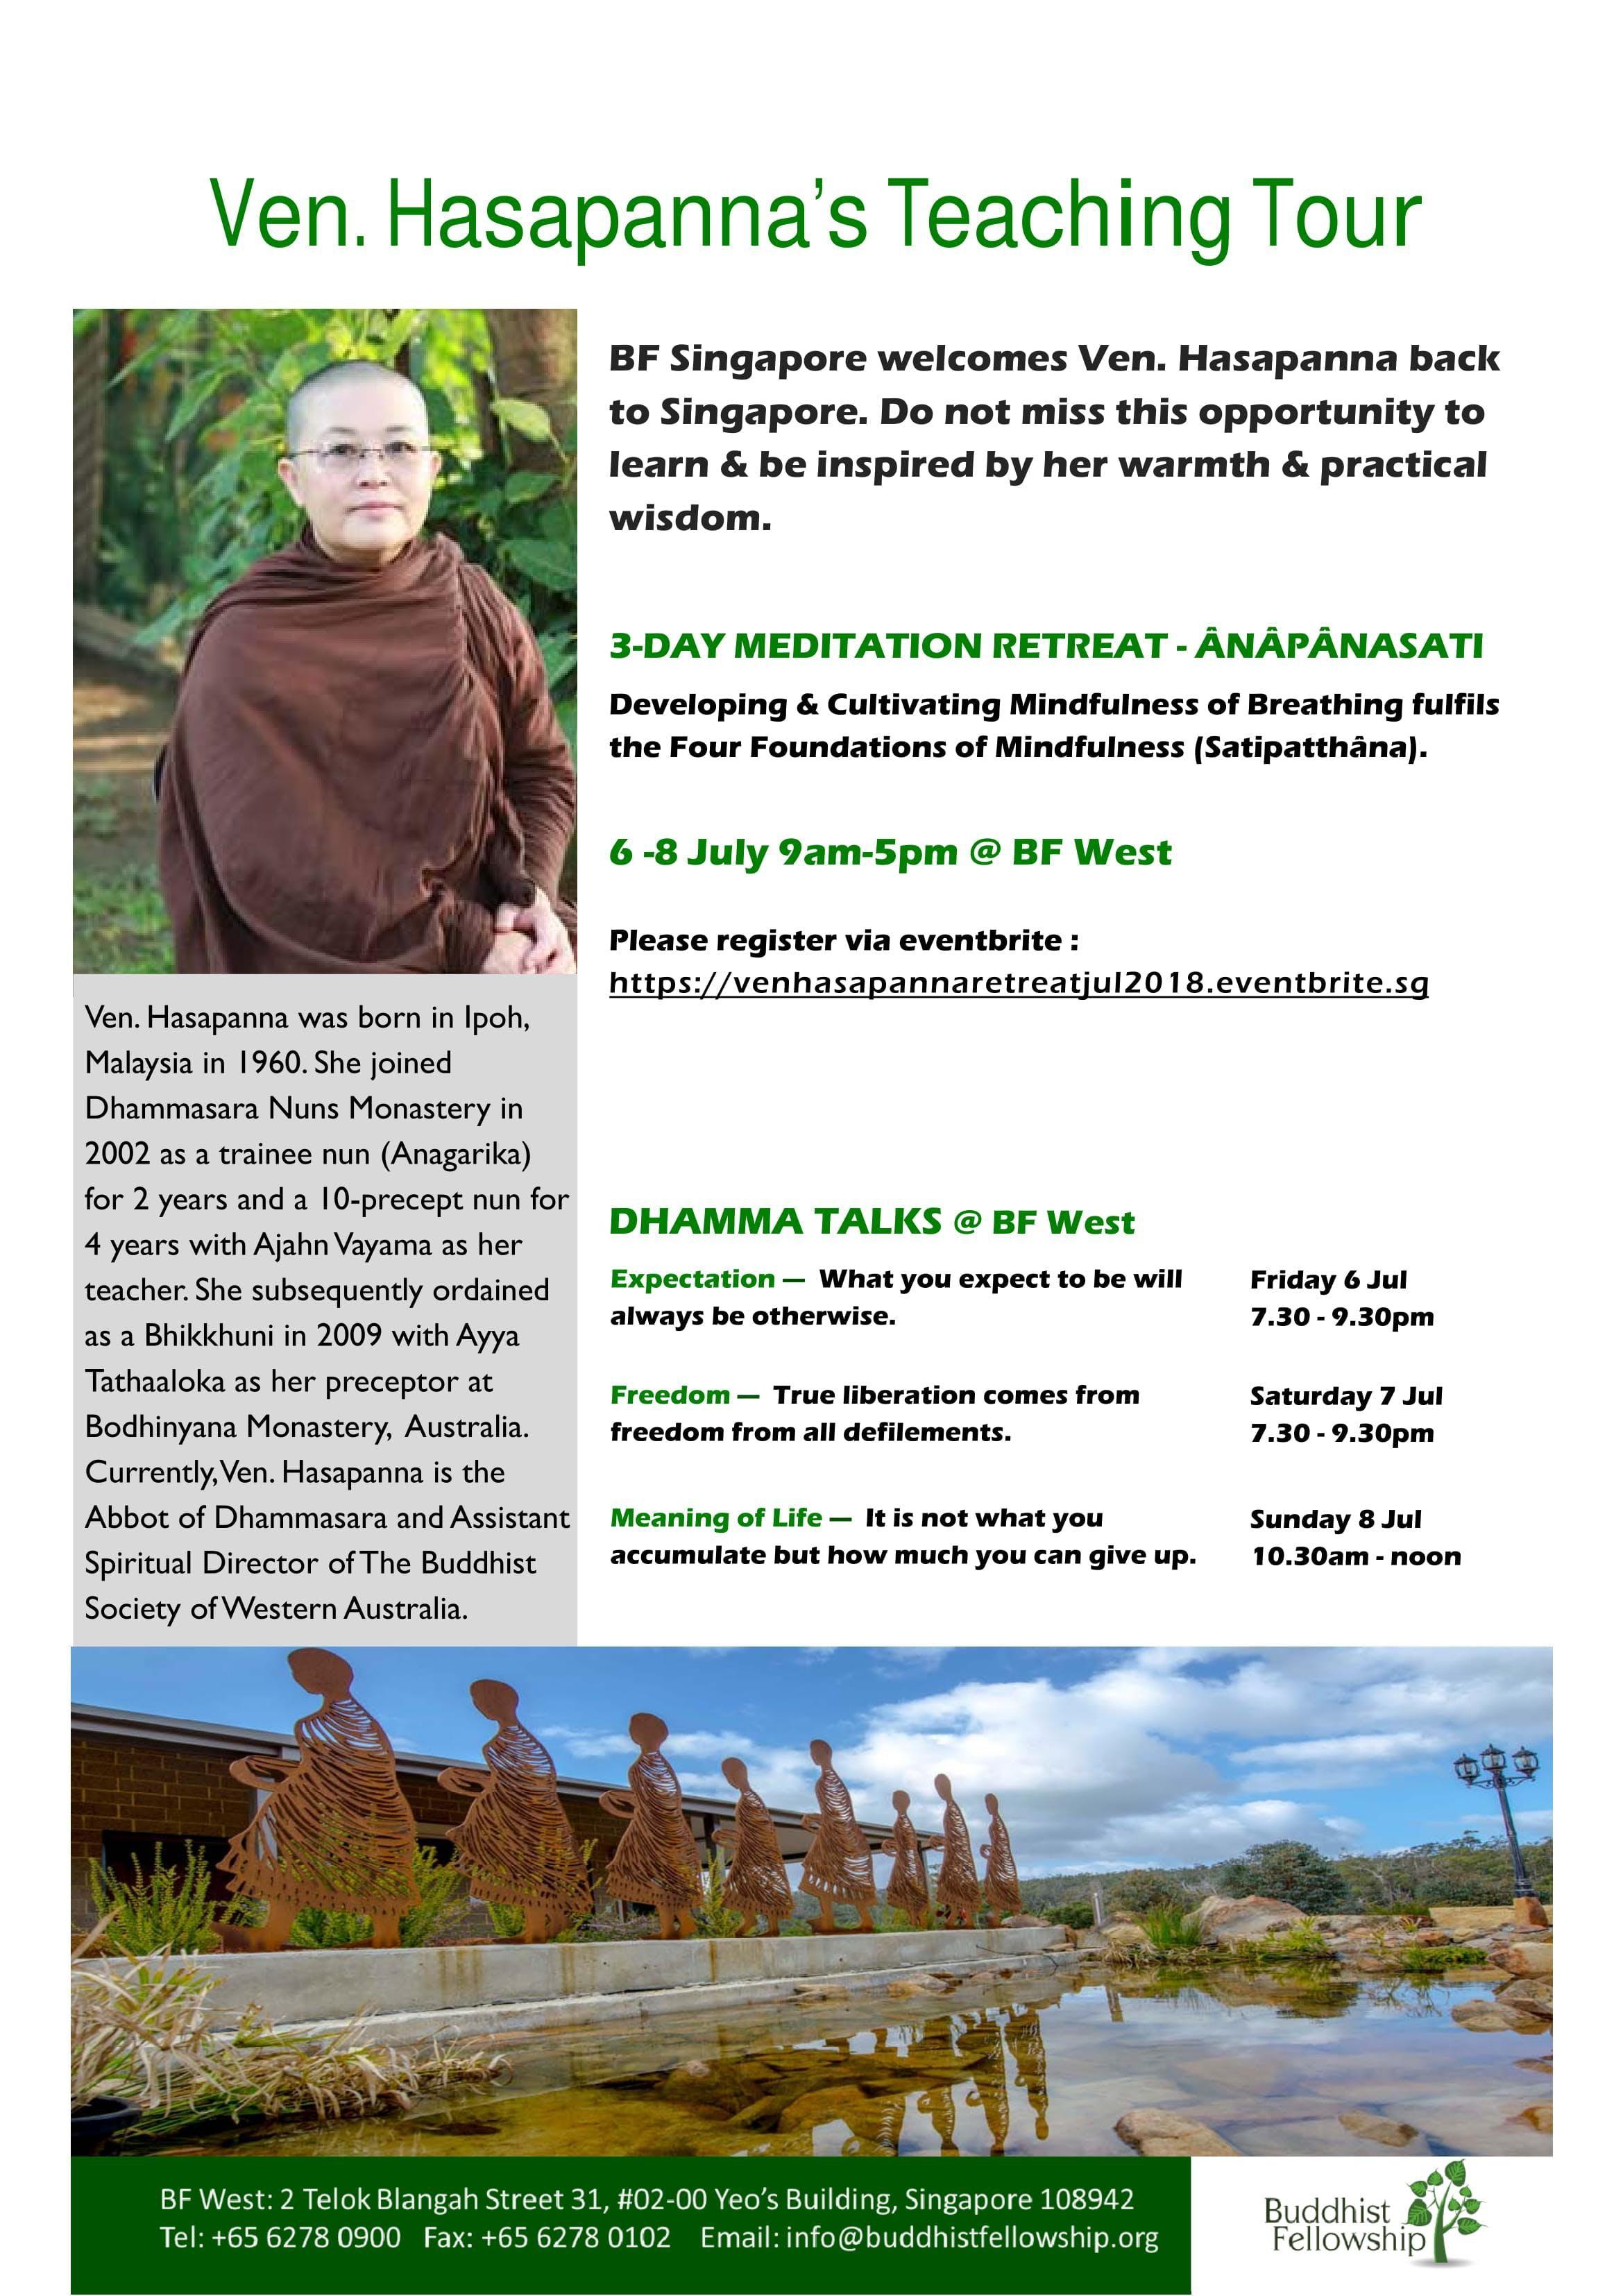 3-Day Meditation Retreat with Ven Hasapanna